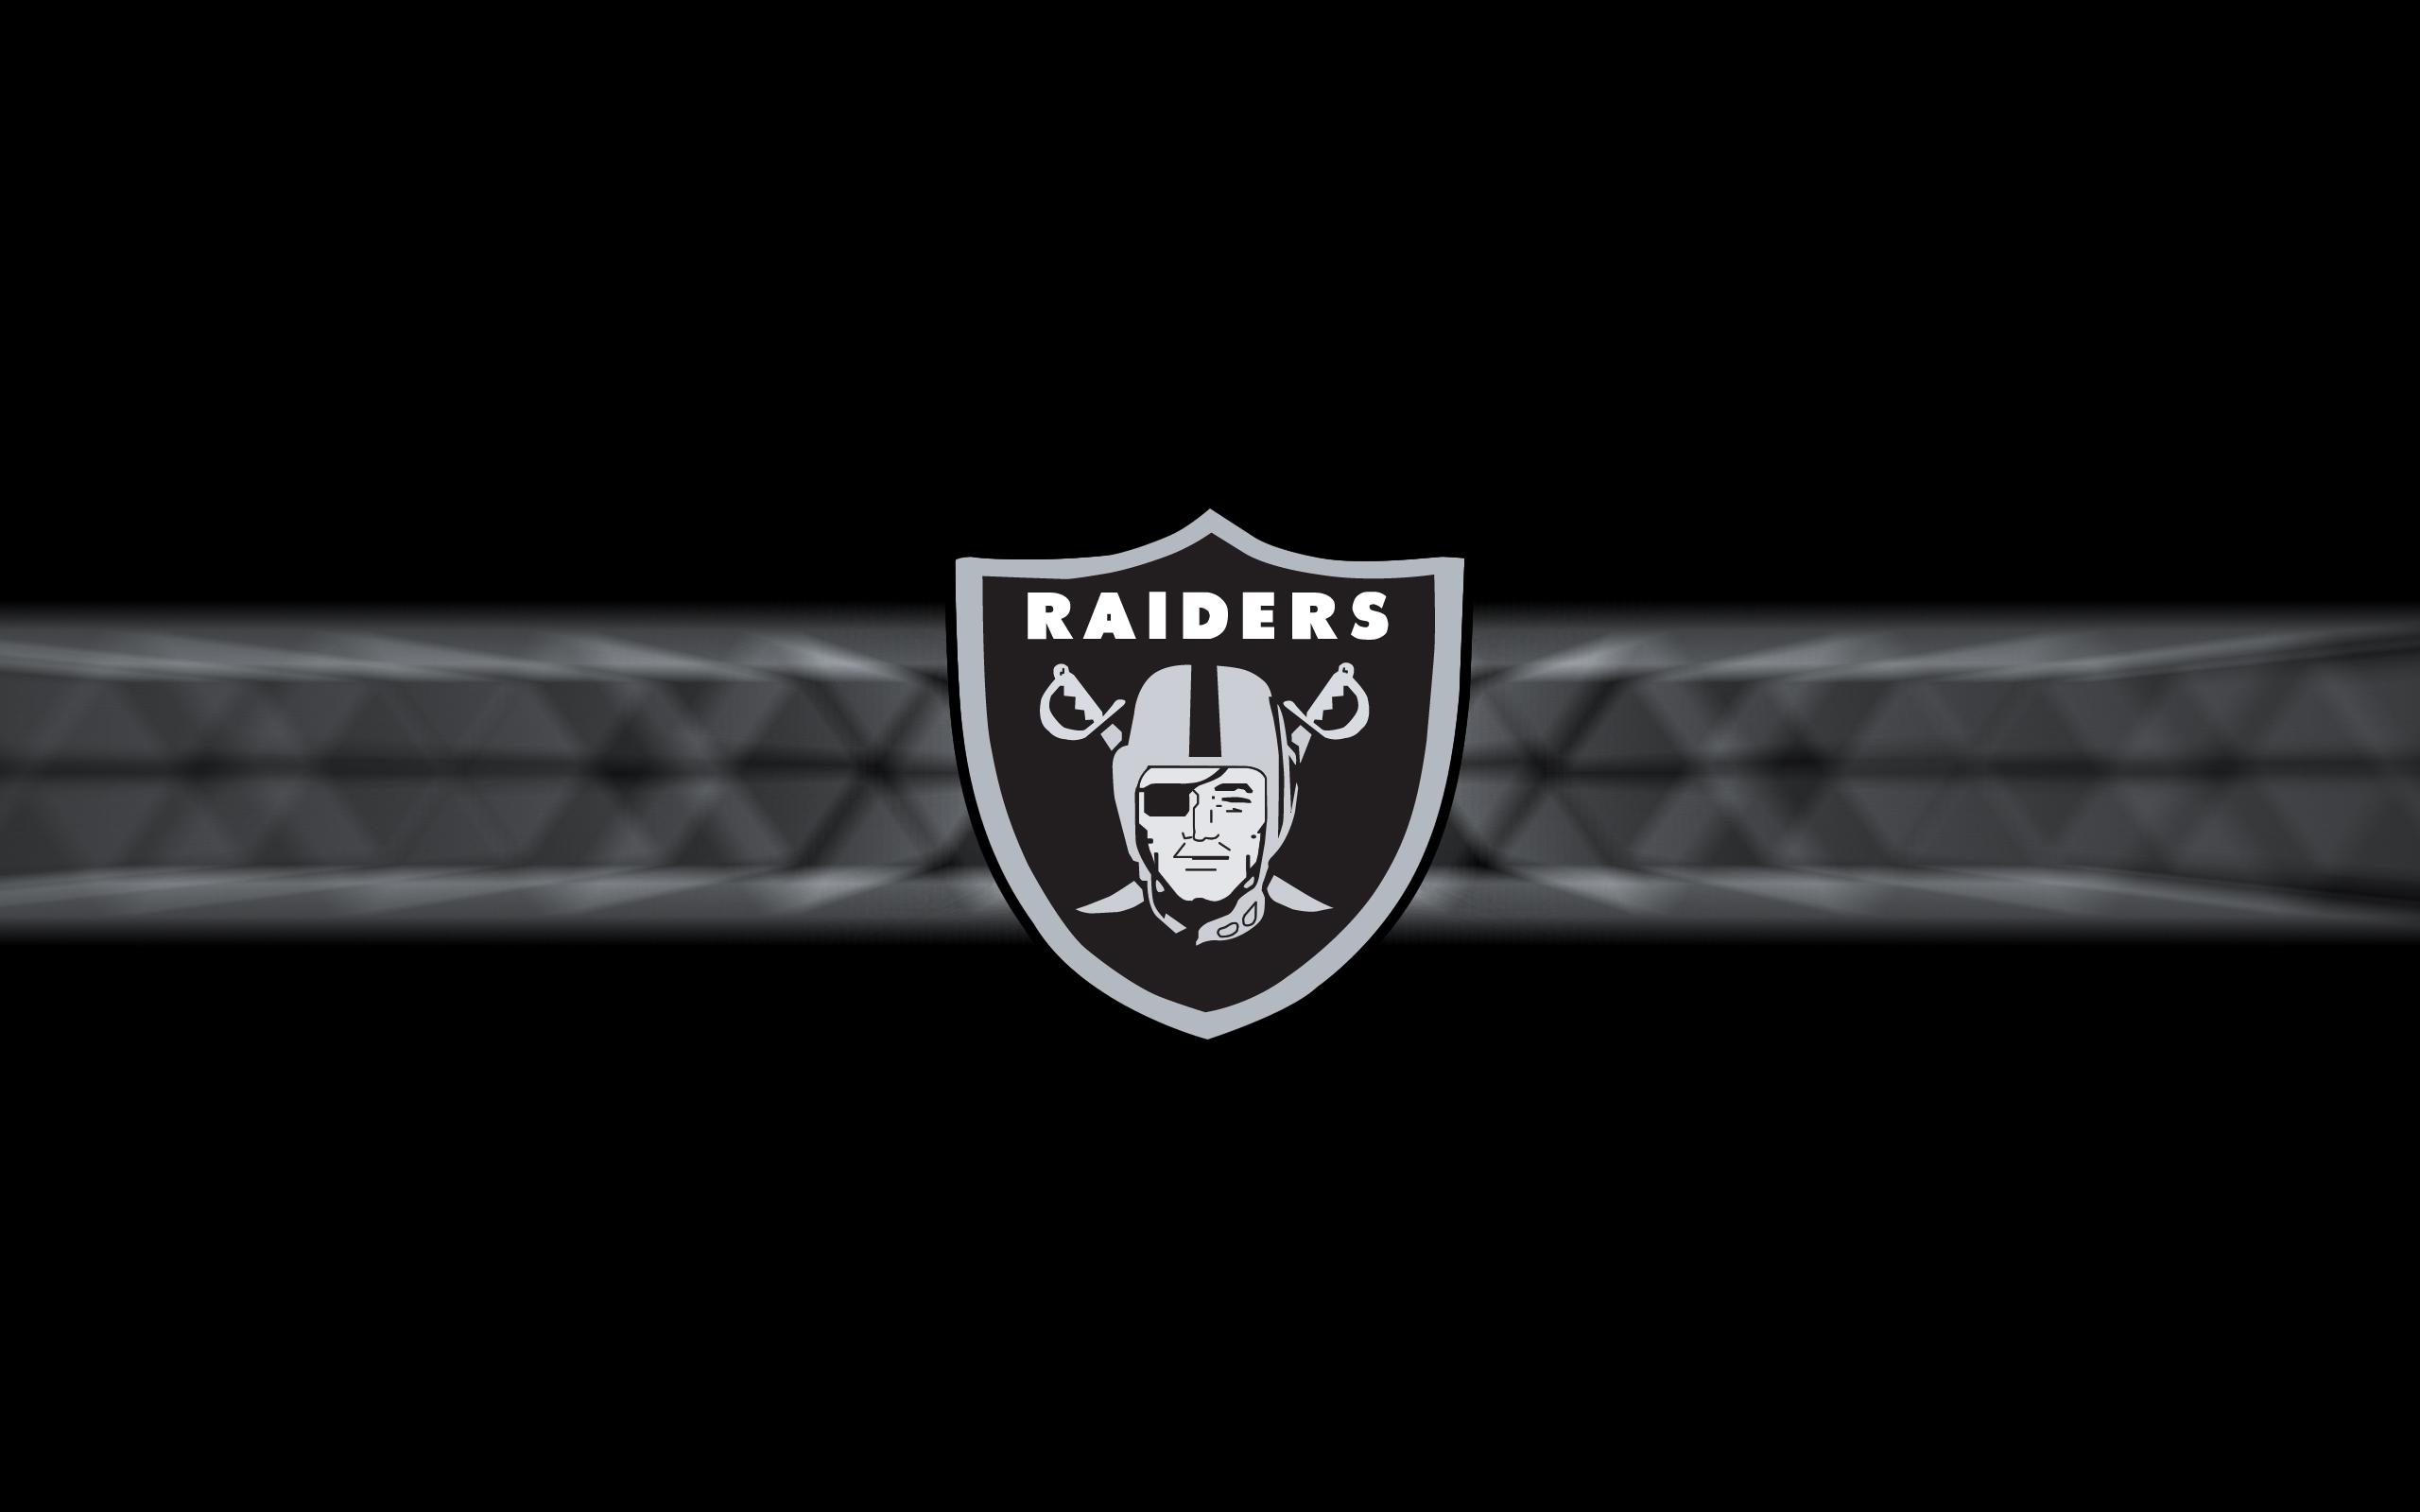 Free 3d Oakland Raiders Live Wallpaper Oakland Raiders Wallpaper 2560x1600 73401